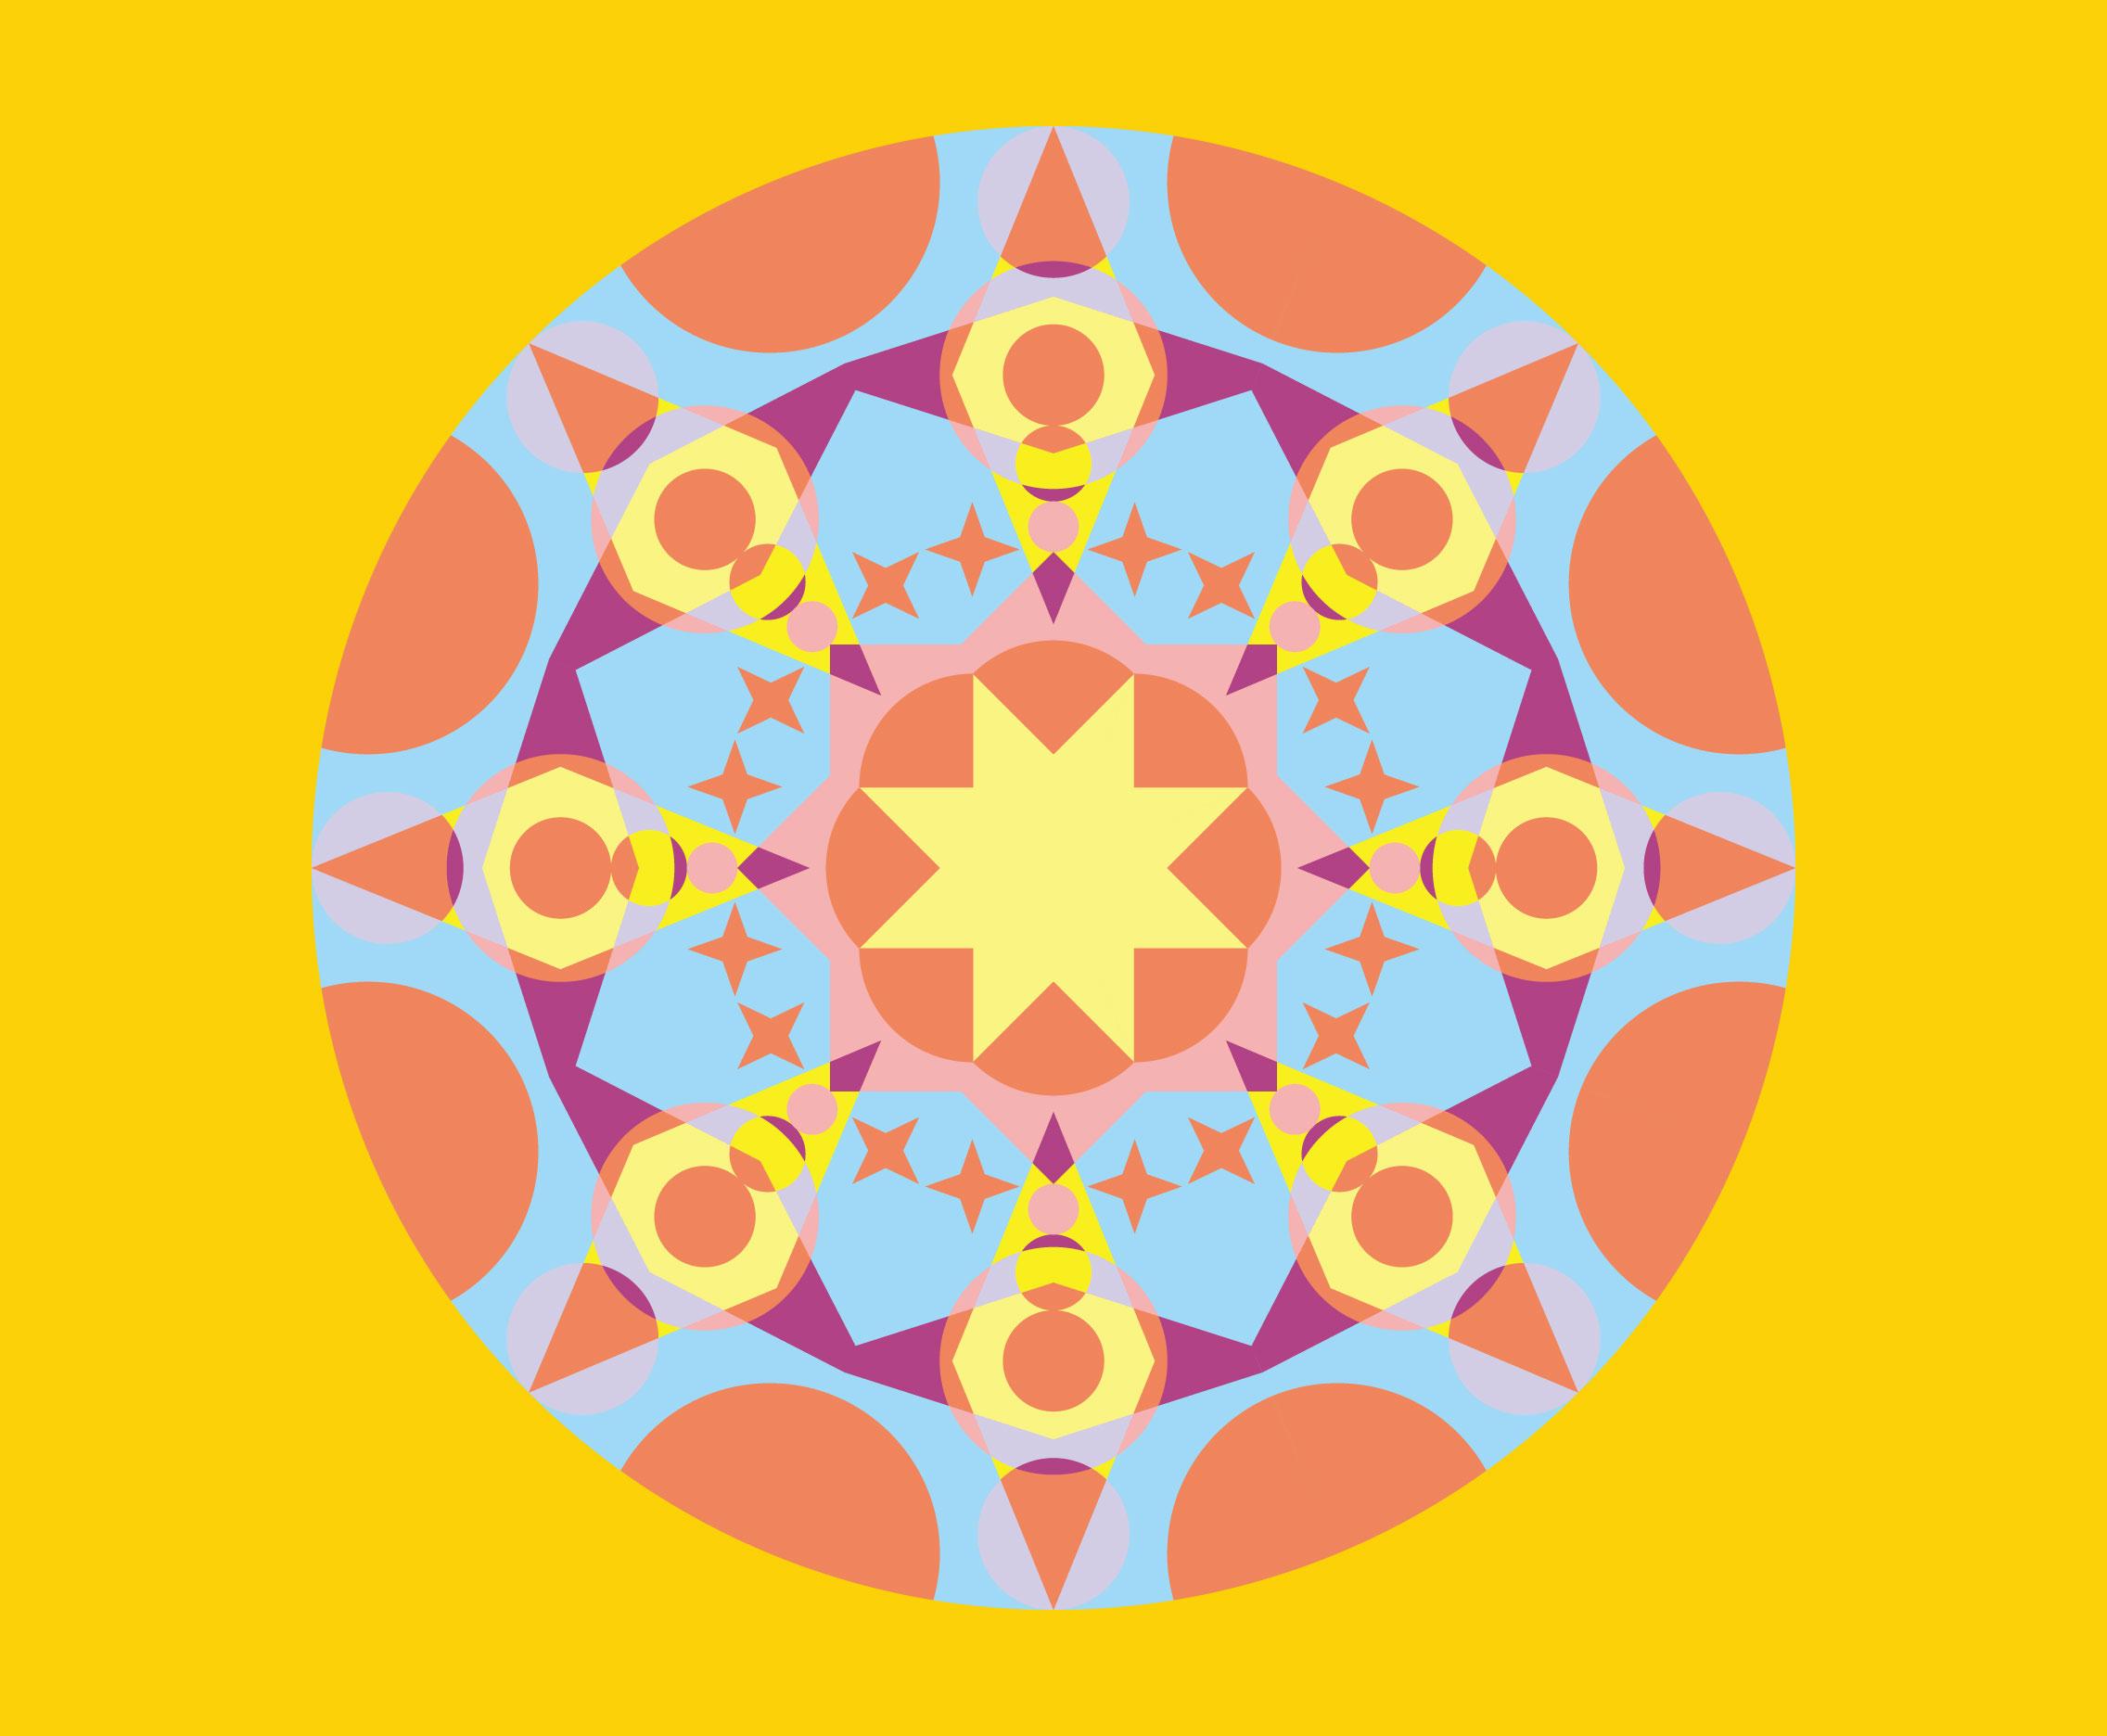 Geometric Kaleidoscope Pattern Vector - Download Free Vector Art ...